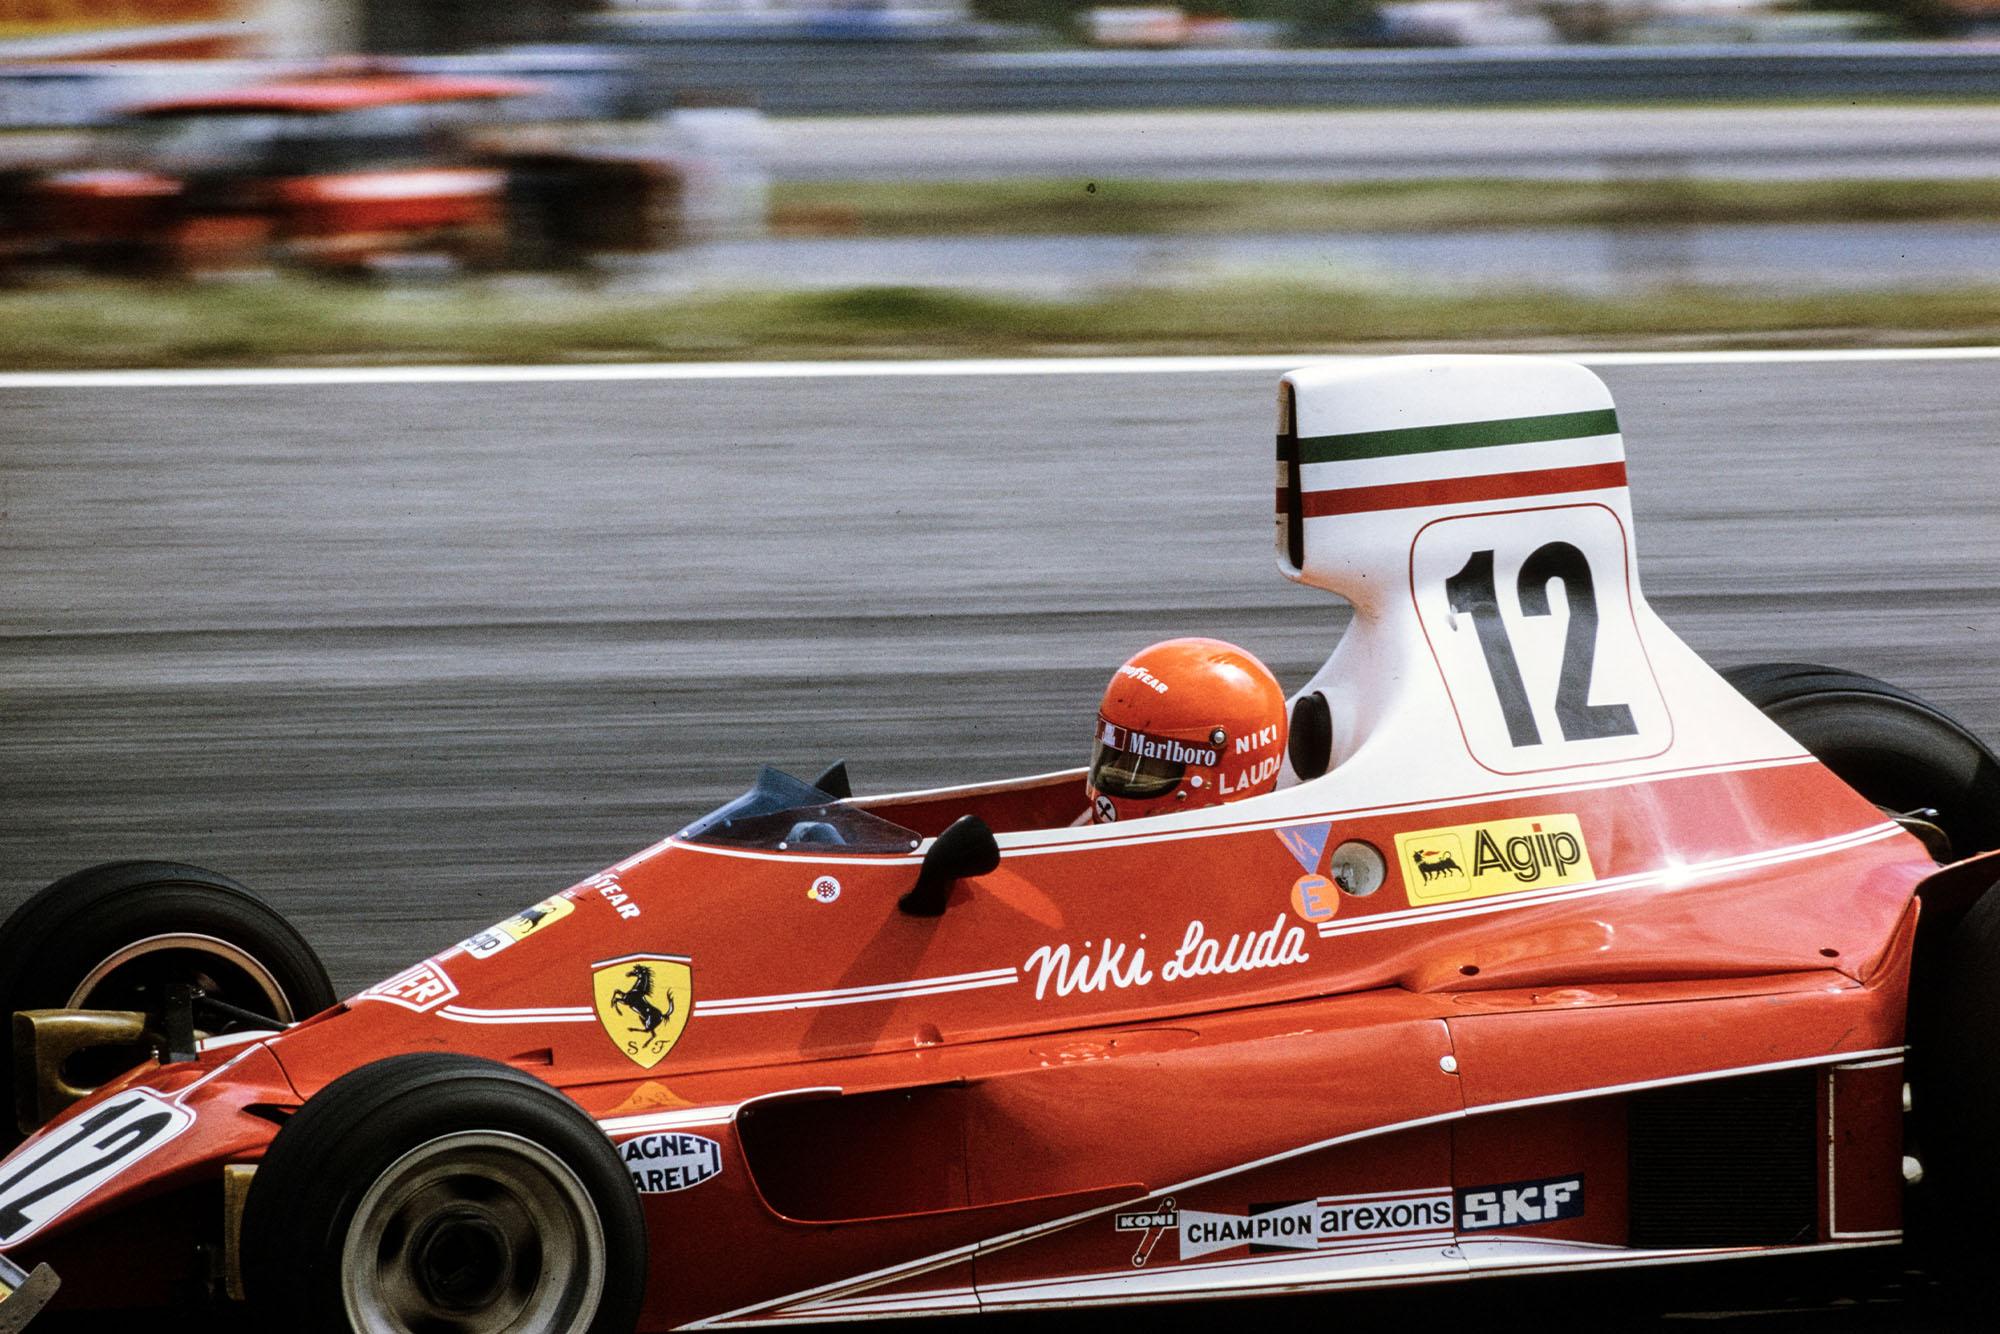 Niki Lauda (Ferrari) throws his car into a corner at the 1975 Swedish Grand Prix.